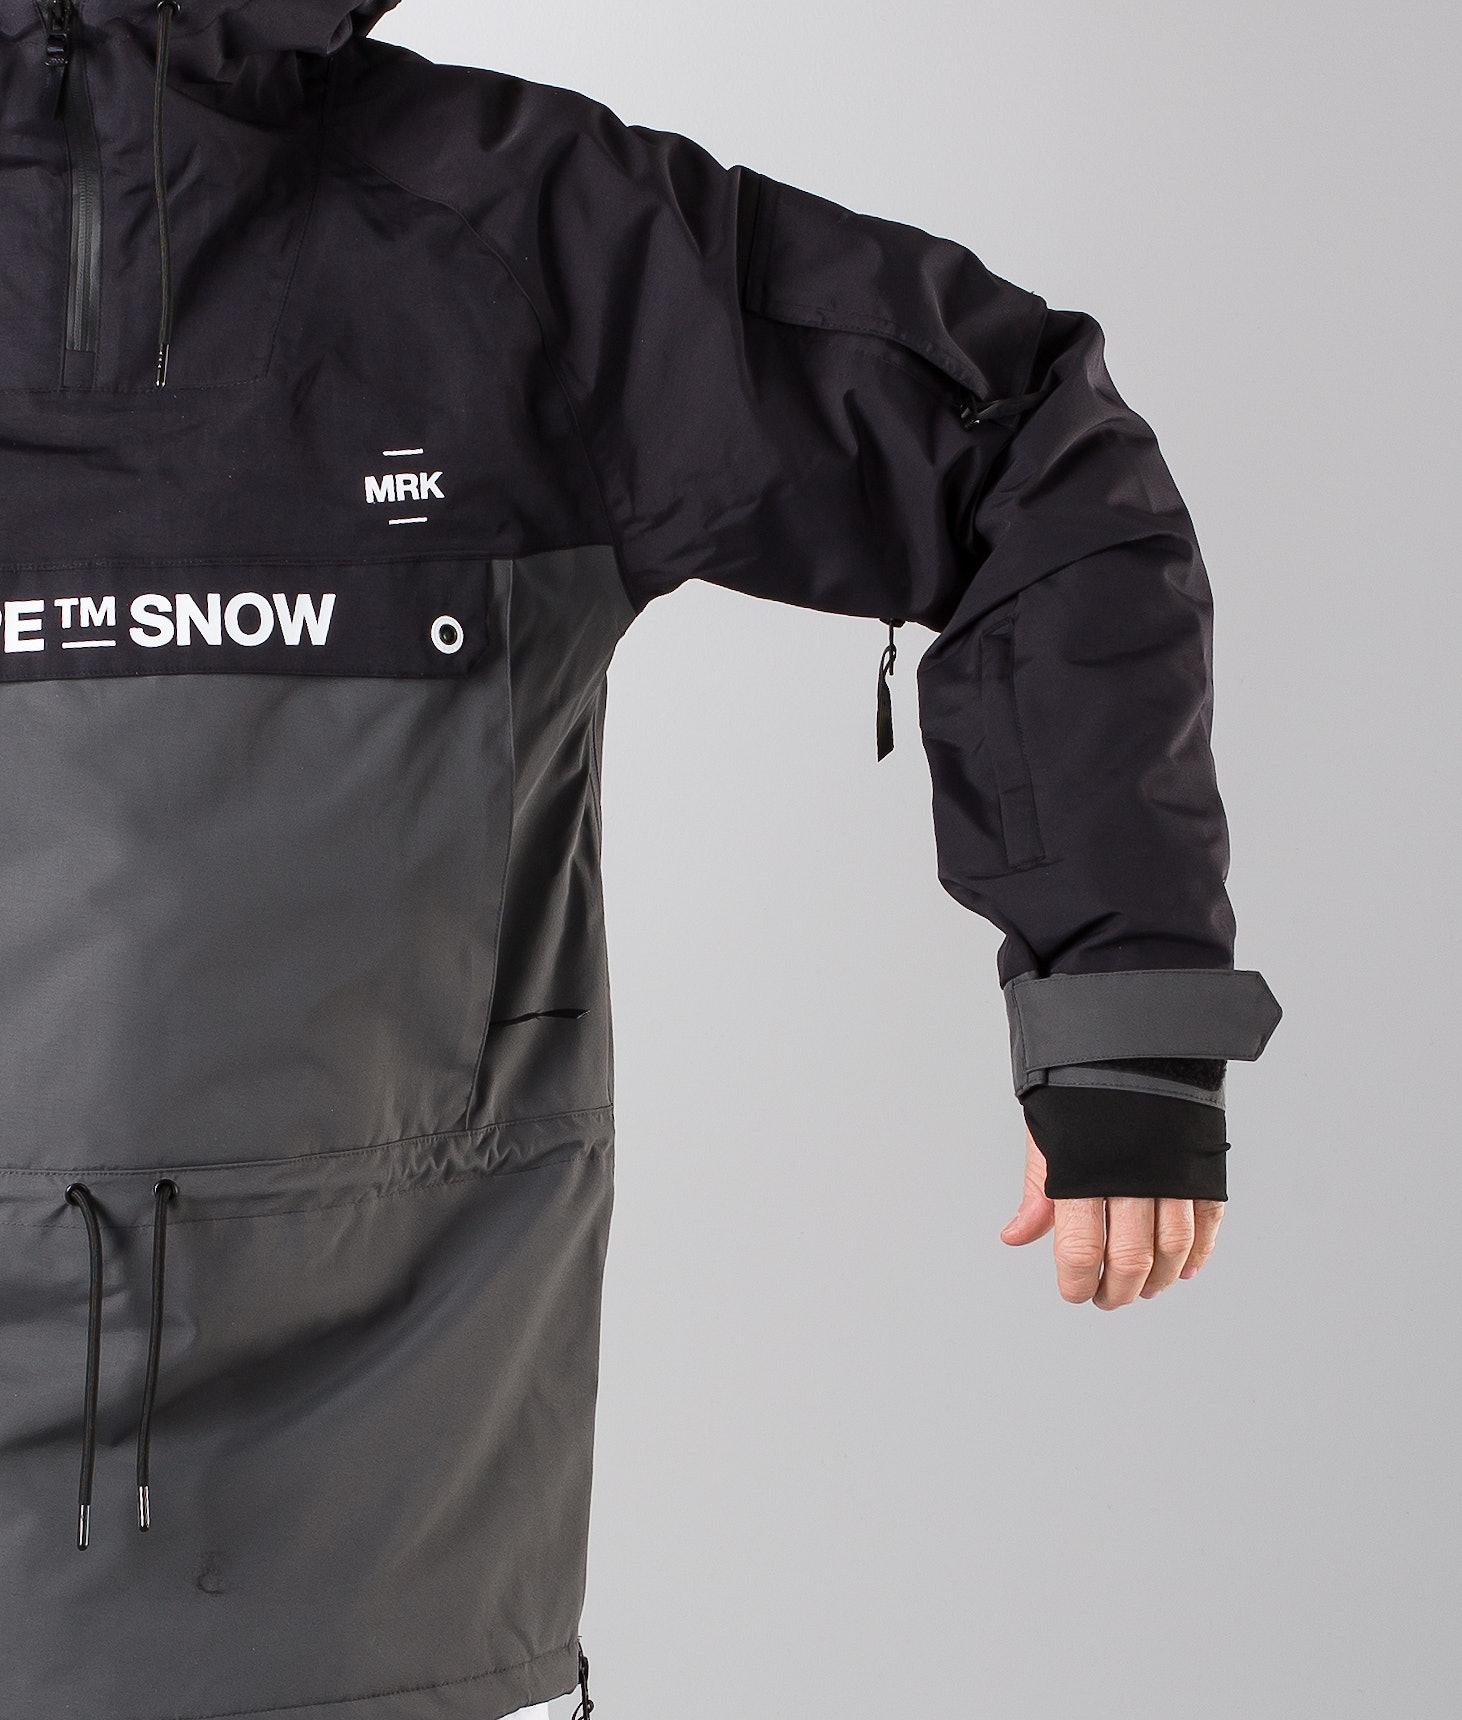 ef269402e9f Dope Annok DSC Ski Jacket Black Dark Grey II - Ridestore.com